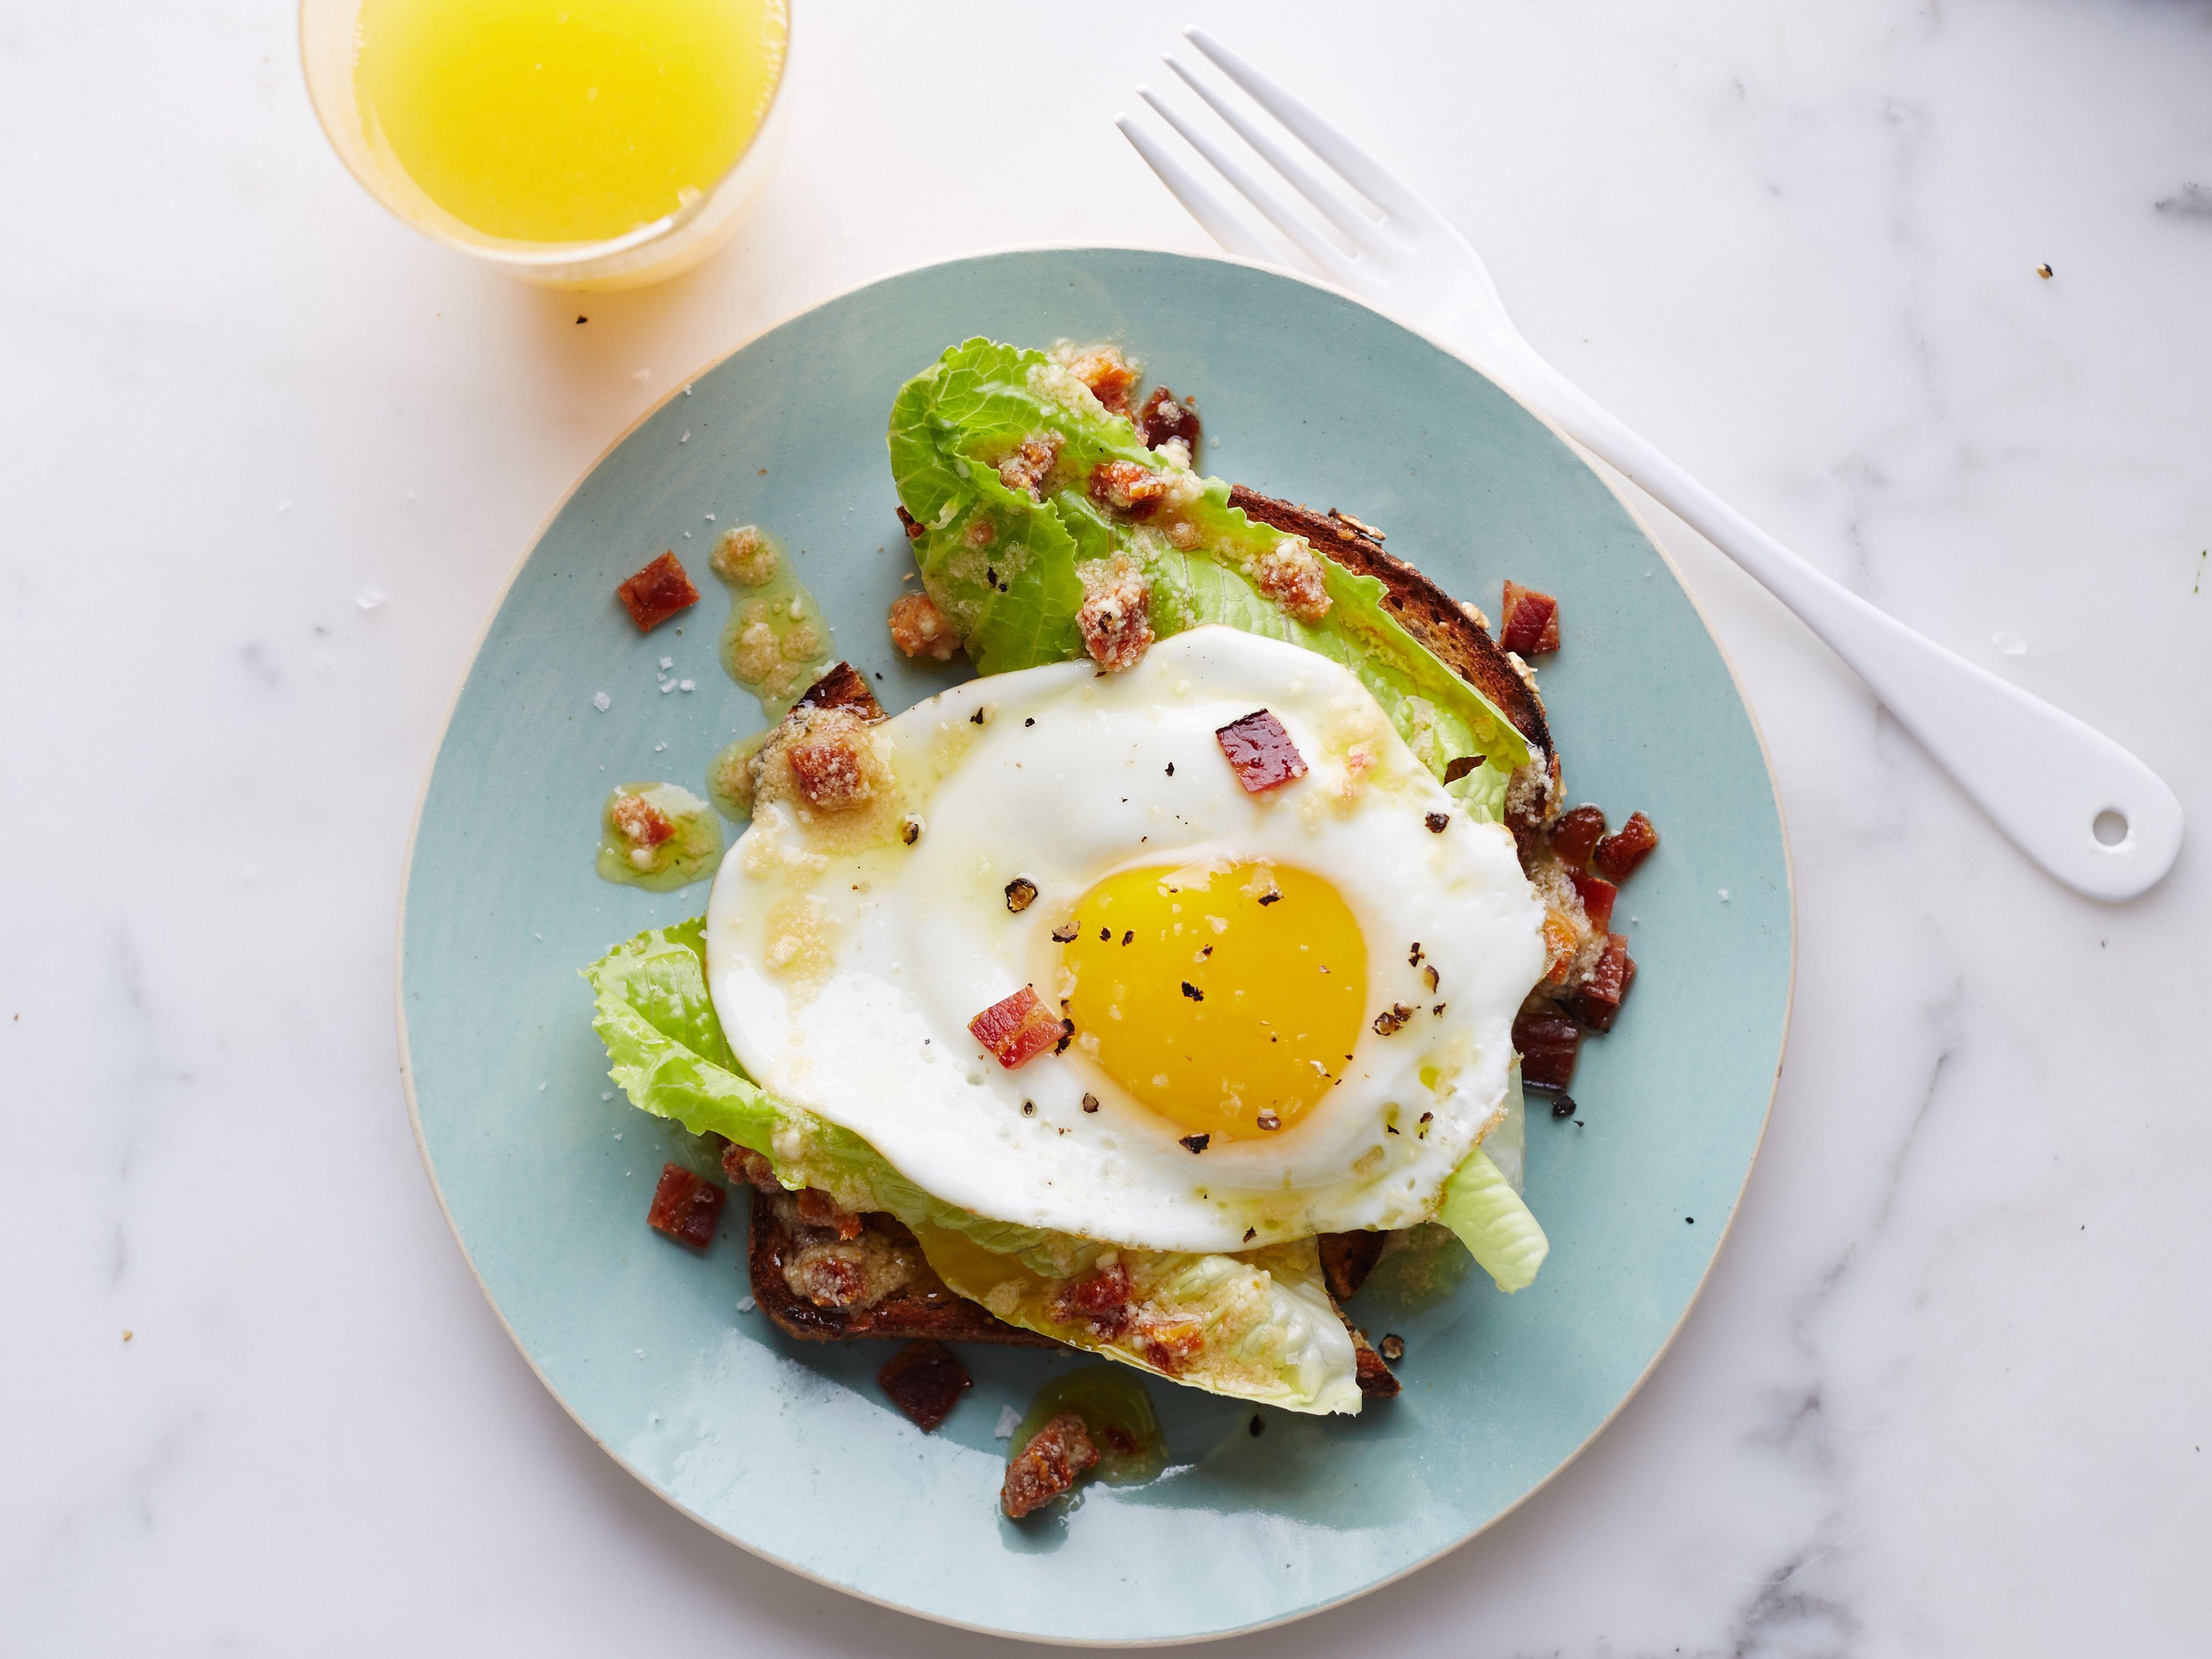 Bacon and egg breakfast caesar salad recipe caesar salad bacon bacon and egg breakfast caesar salad recipe caesar salad bacon and egg forumfinder Gallery